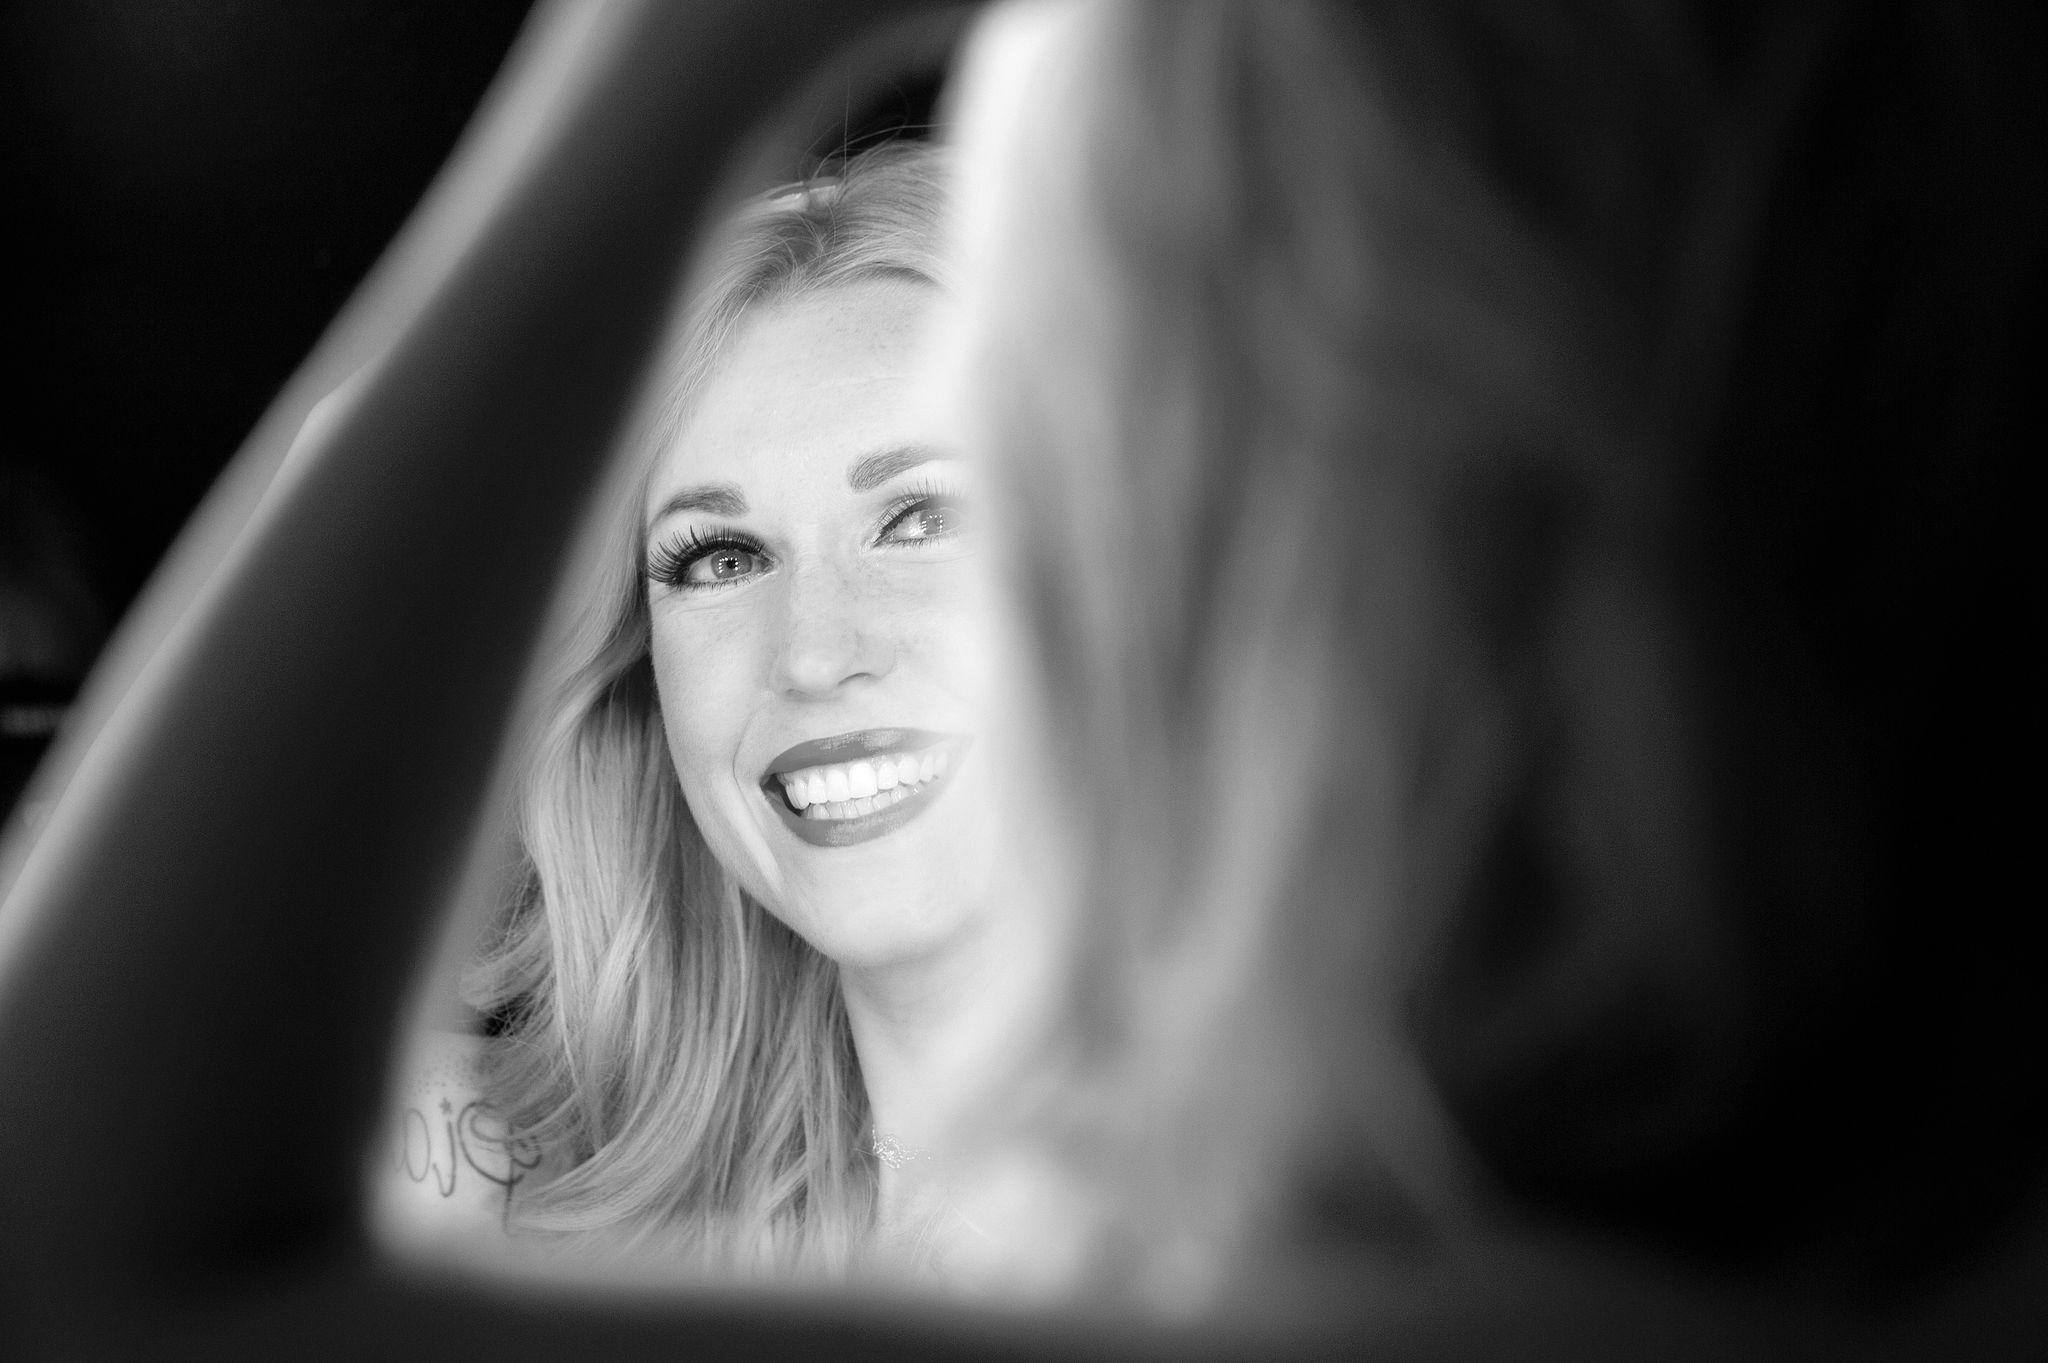 portrait, portraitfotografie, portraitshooting, beauty, beautysfotografie, beautyshooting, paarfotografie, paarshootings, paare, famile, familienfotografie, frauenportraits, maennerportraits, lieblingsfoto, @arleneknipperberg, portraitfotografie, produktfotografie, bewerbungsfotos, portraitphotografie, businessfotografie, fotostudio, shooting, portrait, fotografin, fotograf, fotografie, foto, fotografenmeisterin, ausgezeichnetefotografie, jena, thüringen